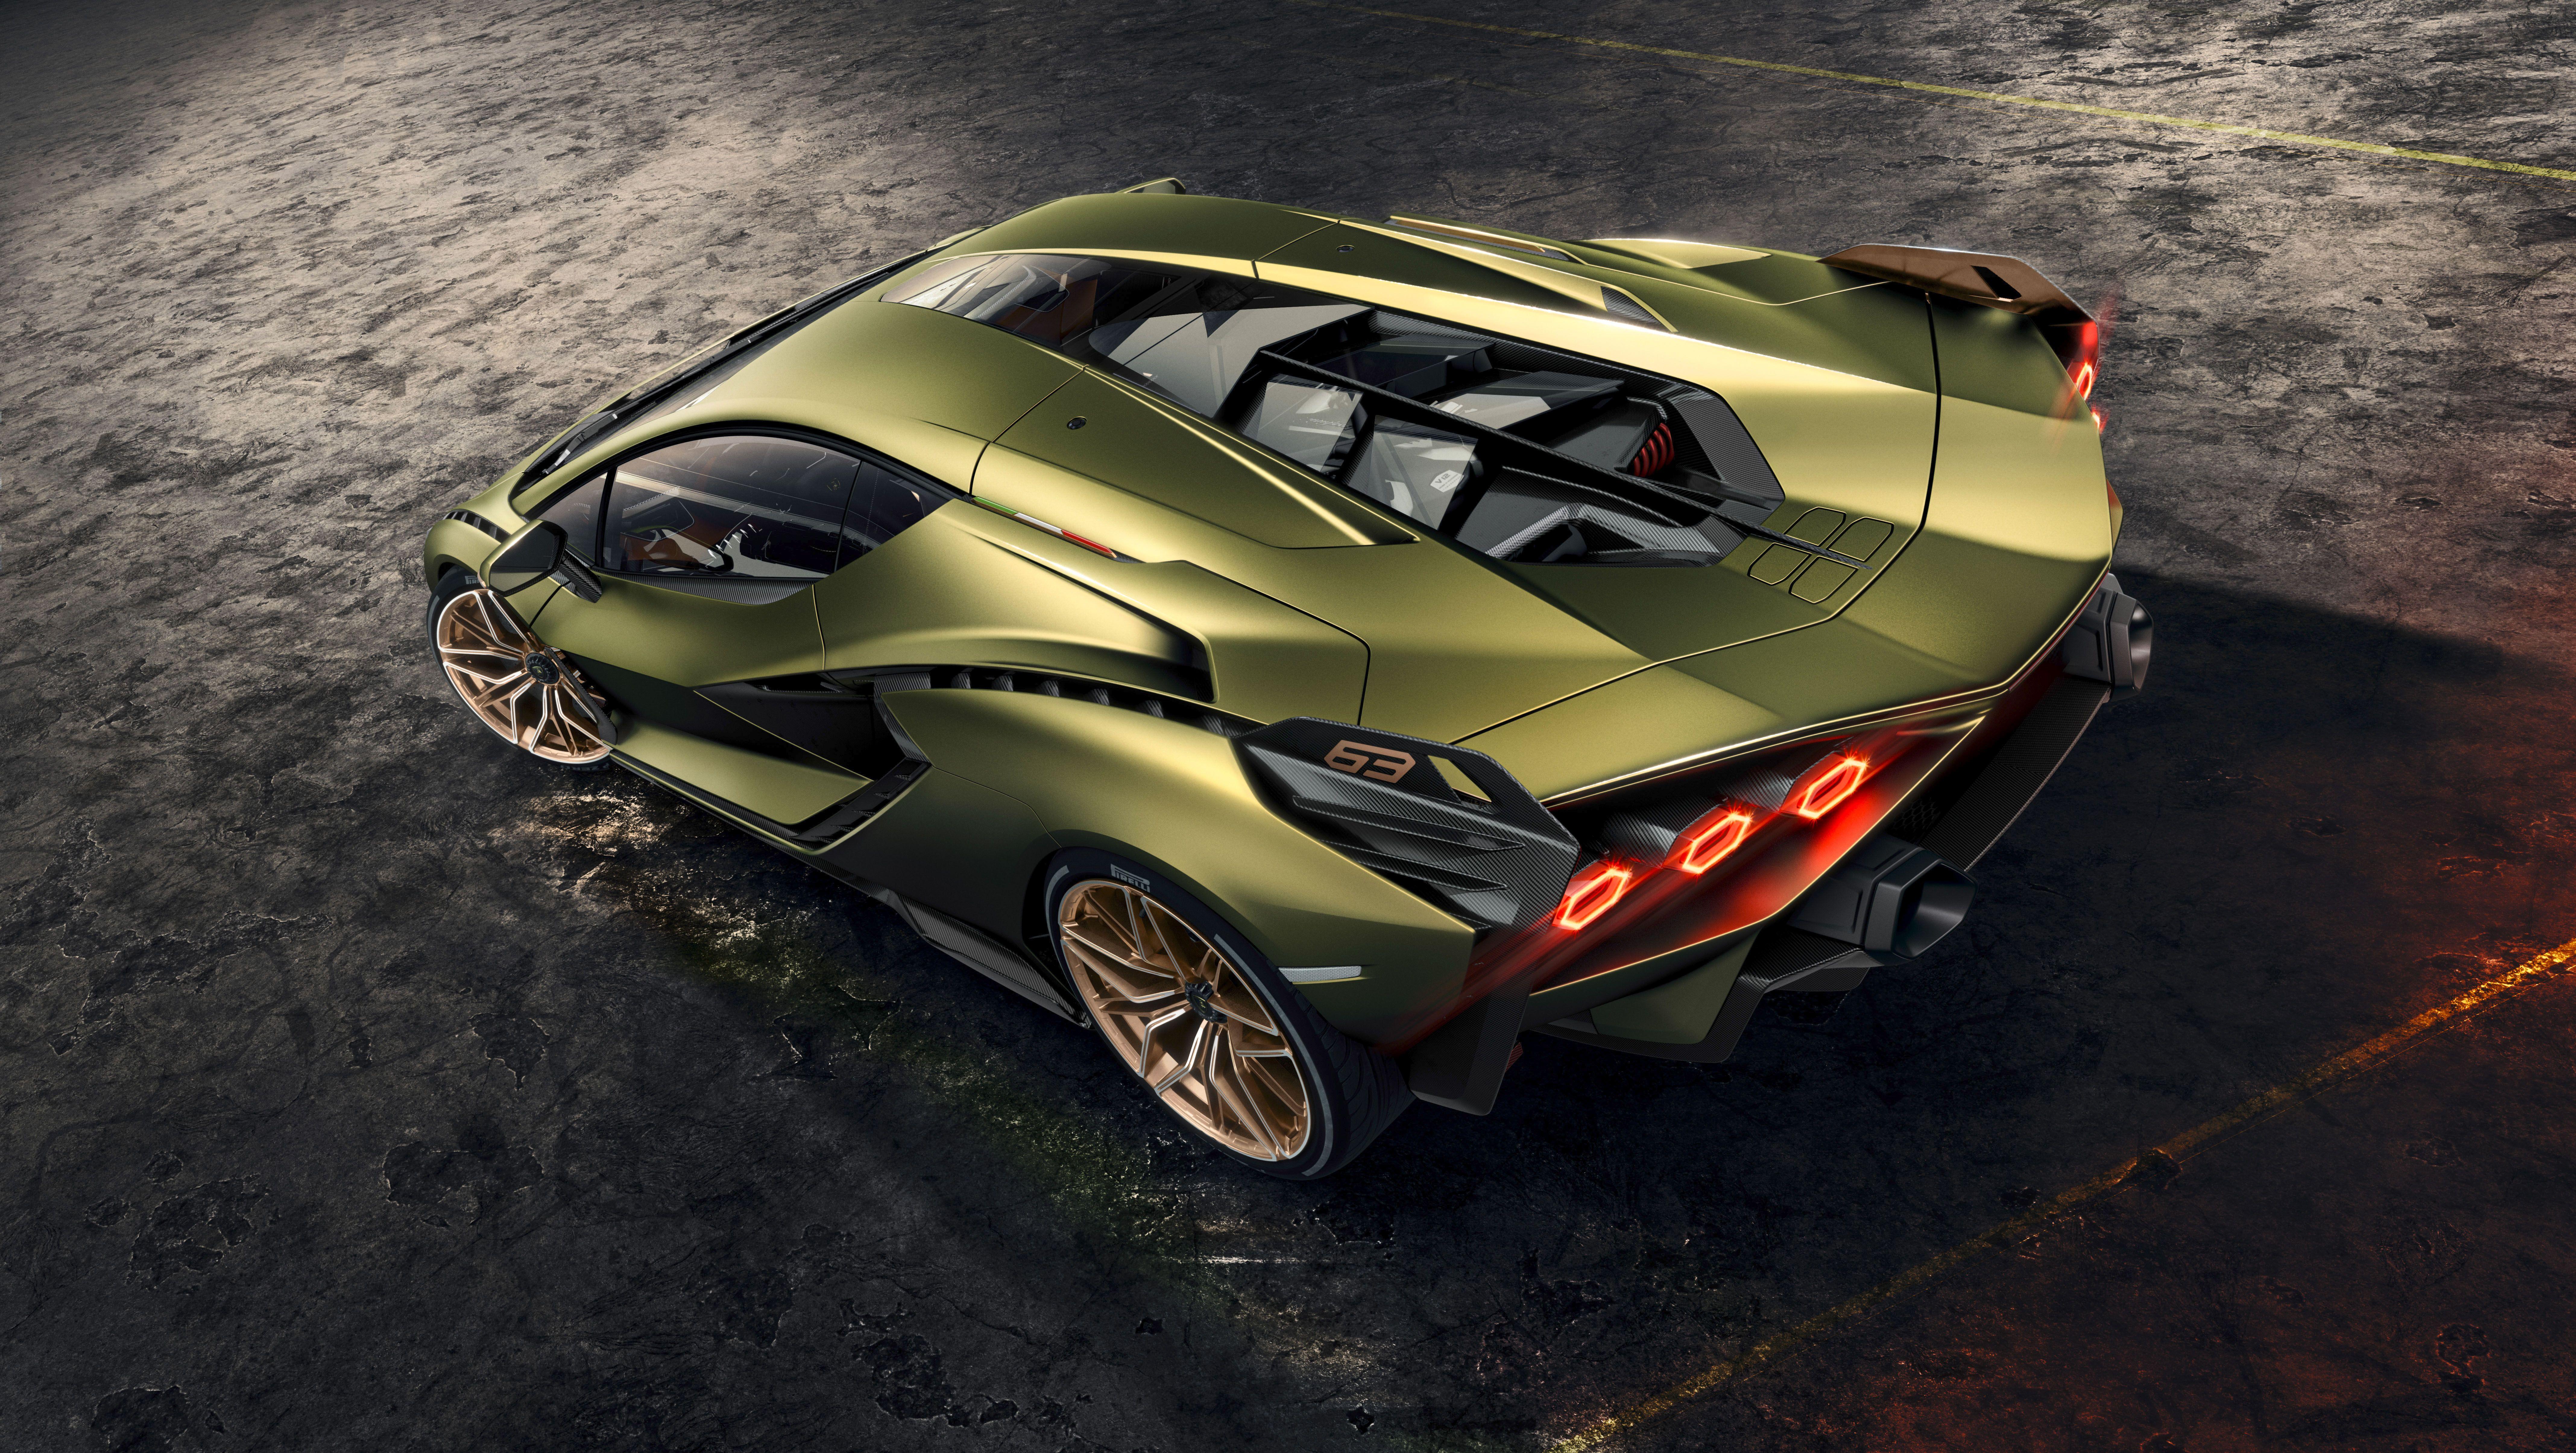 Lamborghini Wants To Rewrite The Book On Electrification For Its Future Series Production Hybrid Models In 2020 Super Cars Lamborghini Supercar Hybrid Car